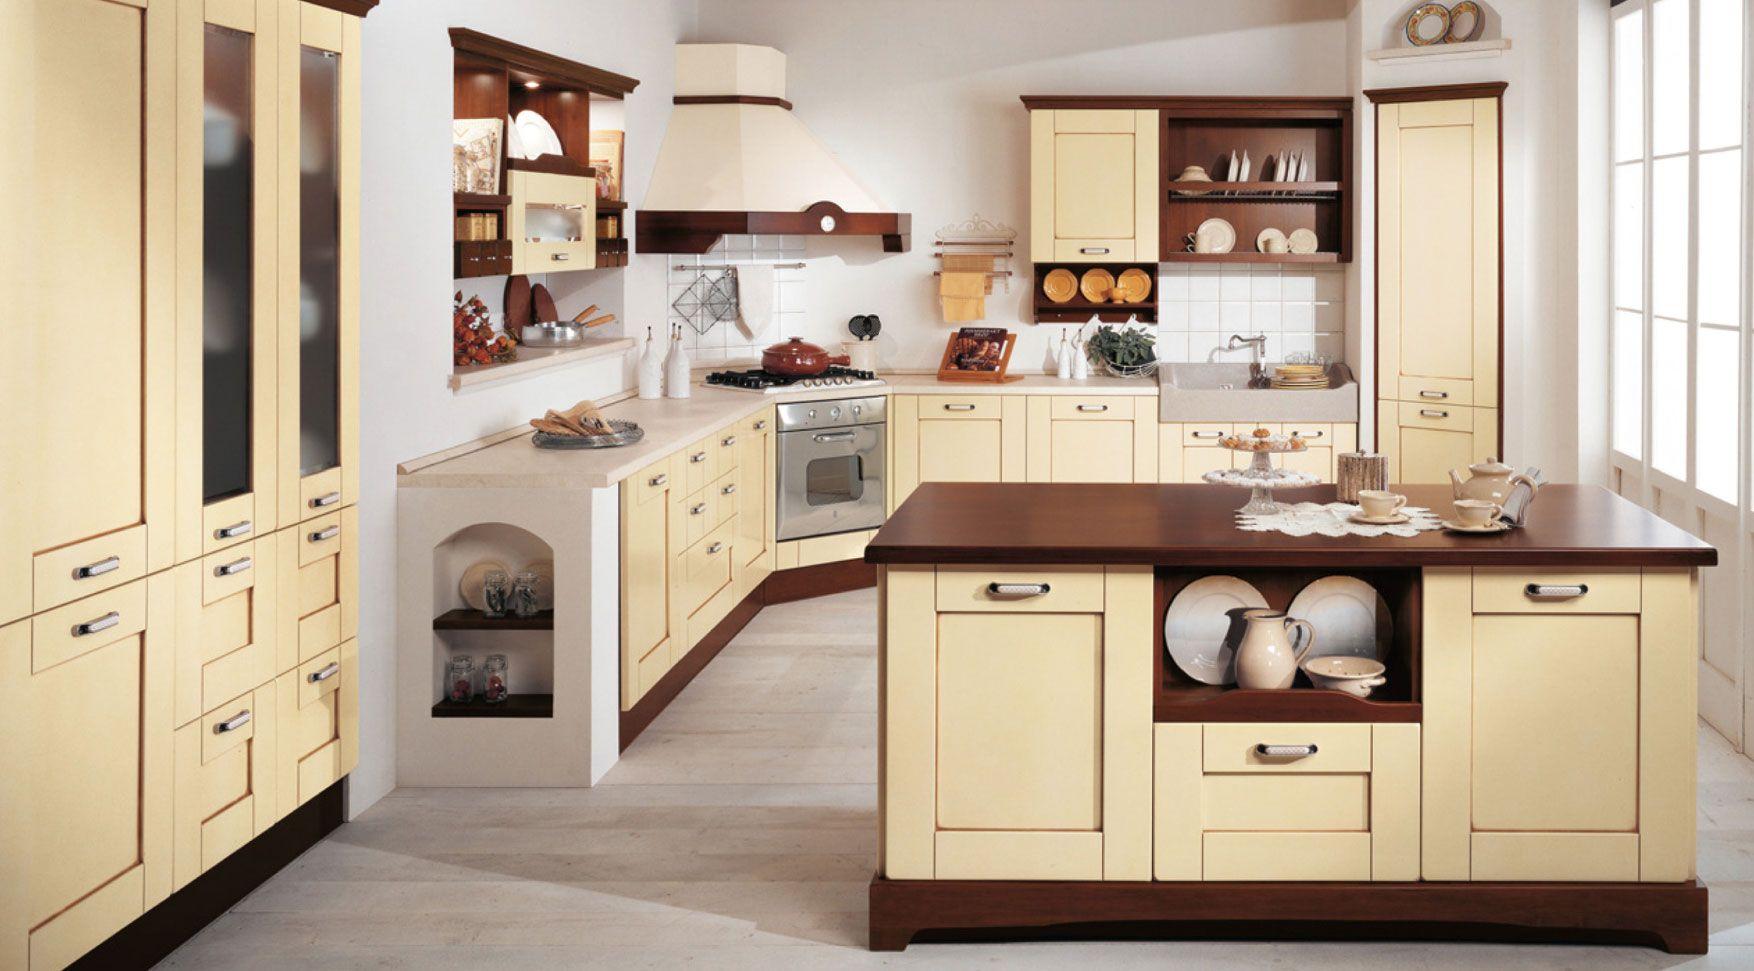 Awesome Cucine Classiche Foto Photos - Ideas & Design 2017 ...